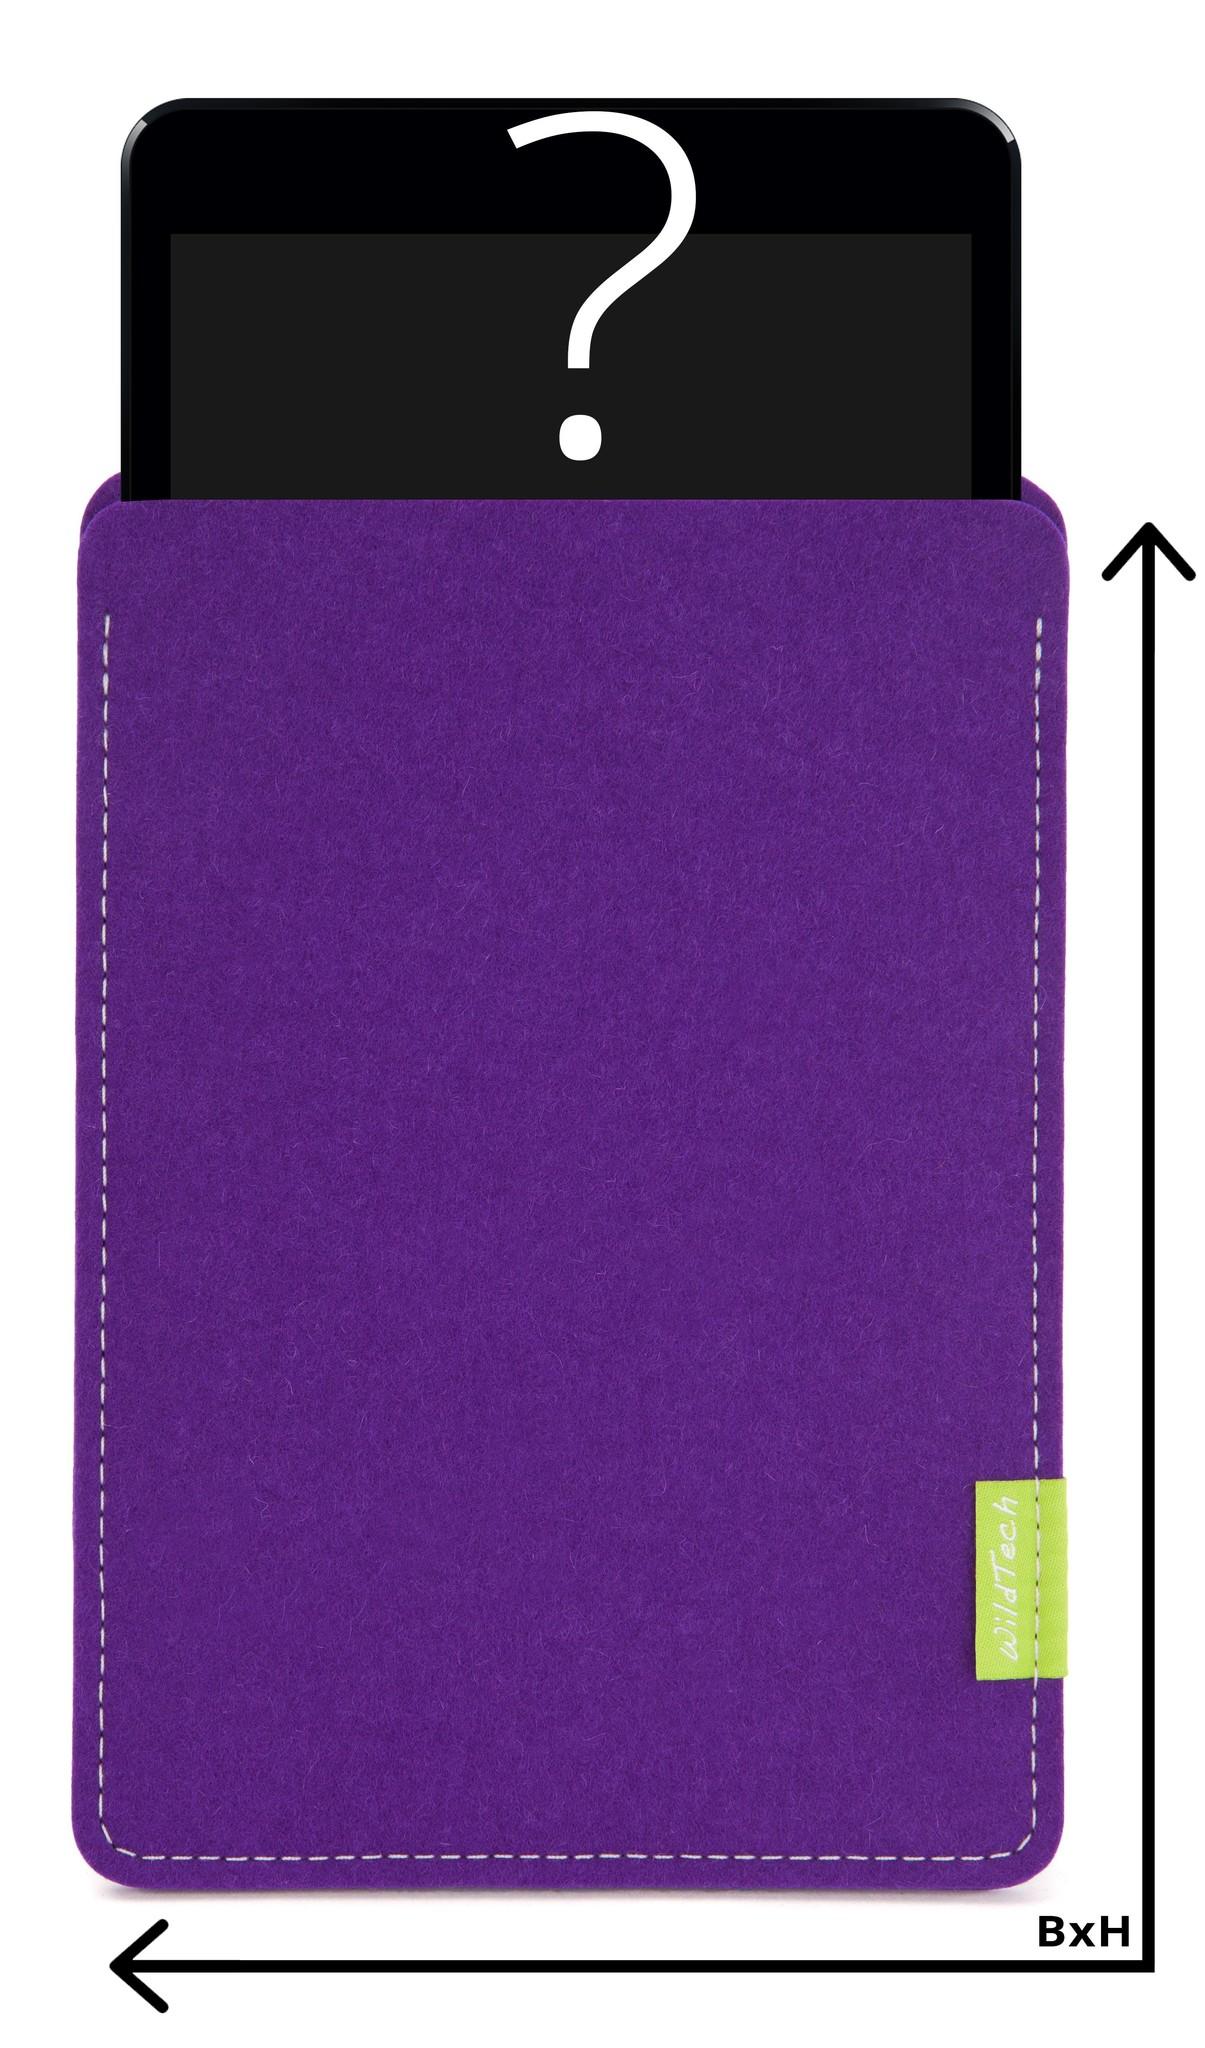 Individuelles Tablet Sleeve Lila-1